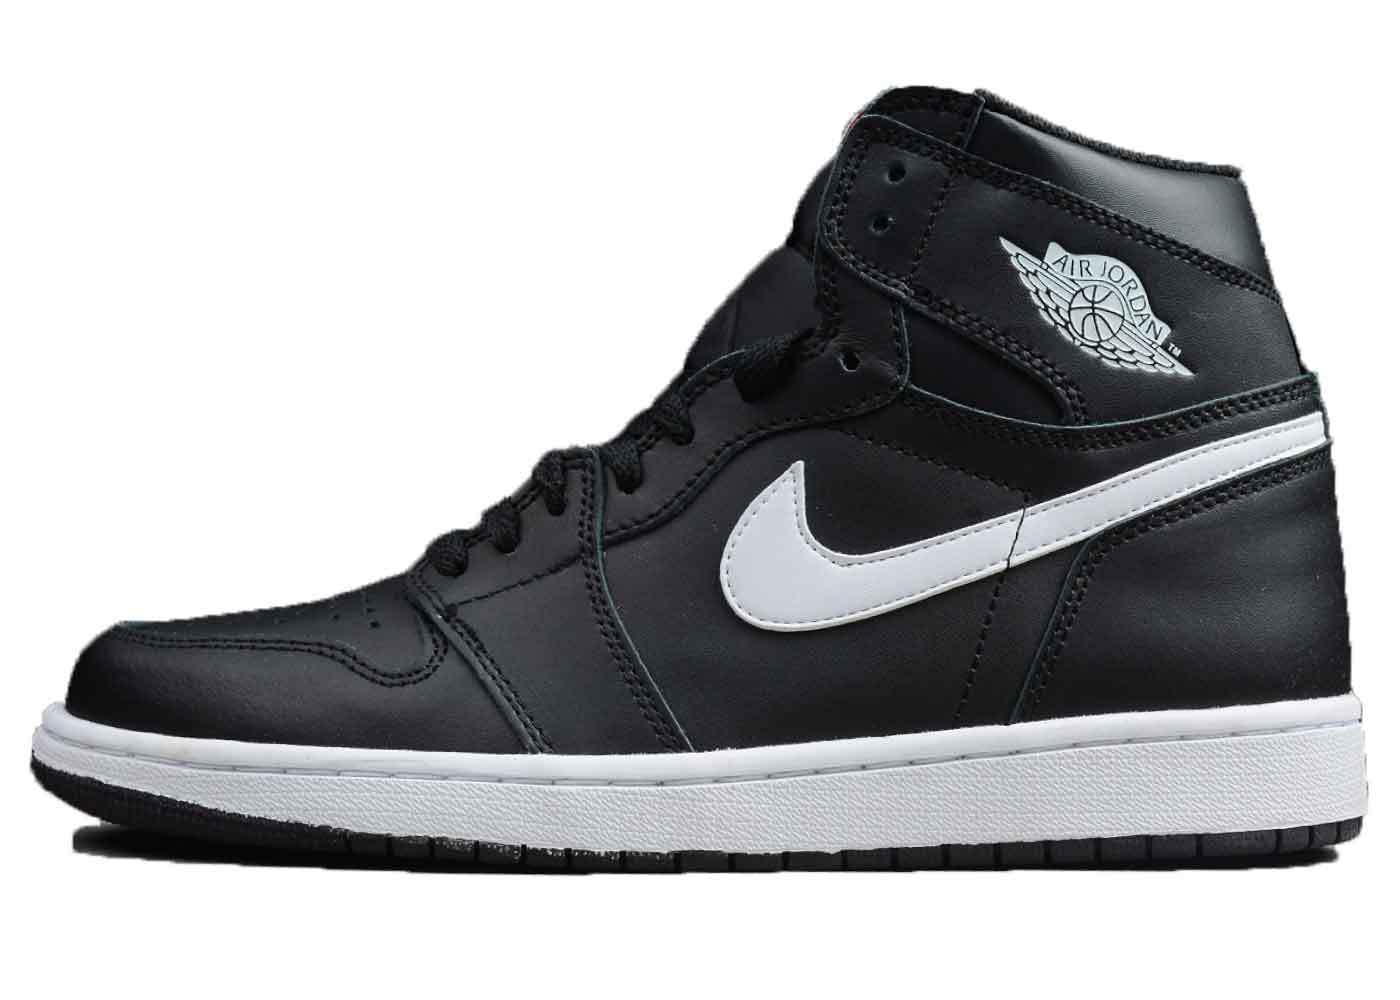 Nike Air Jordan 1 Retro Yin Yang Blackの写真